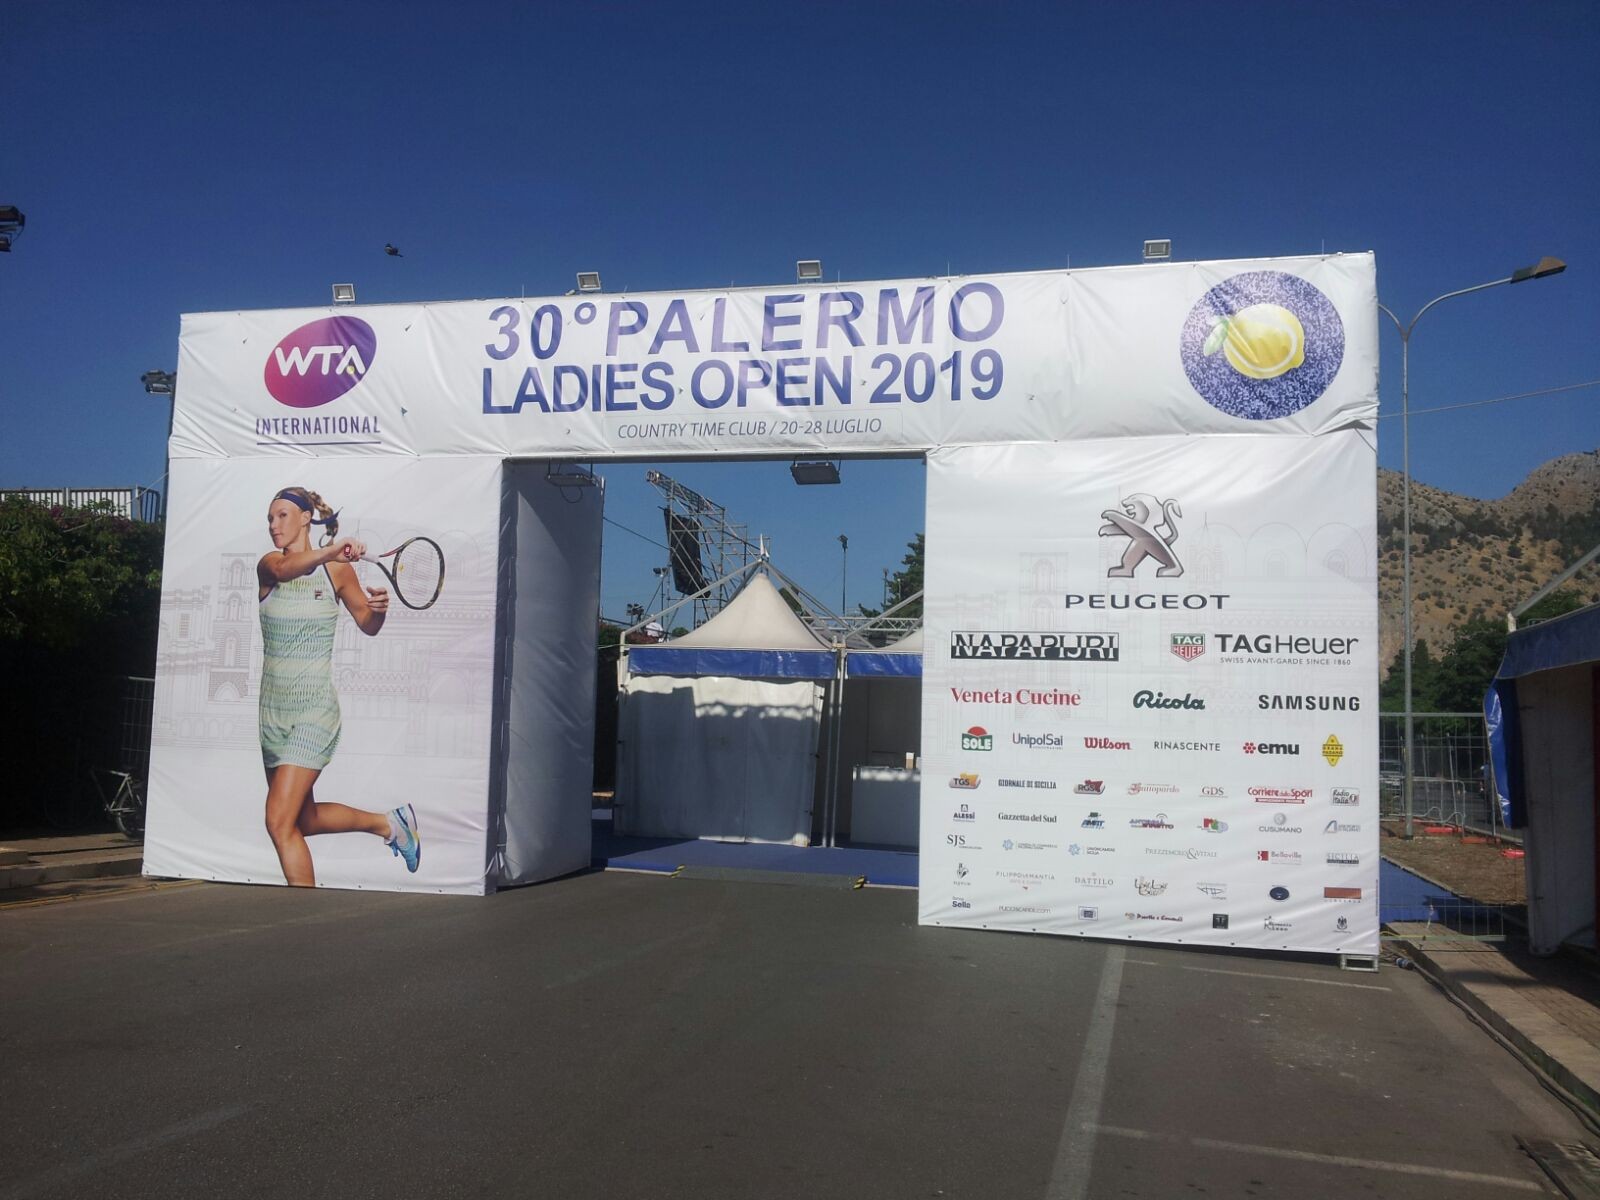 ladies open - internazionali femminili di tennis